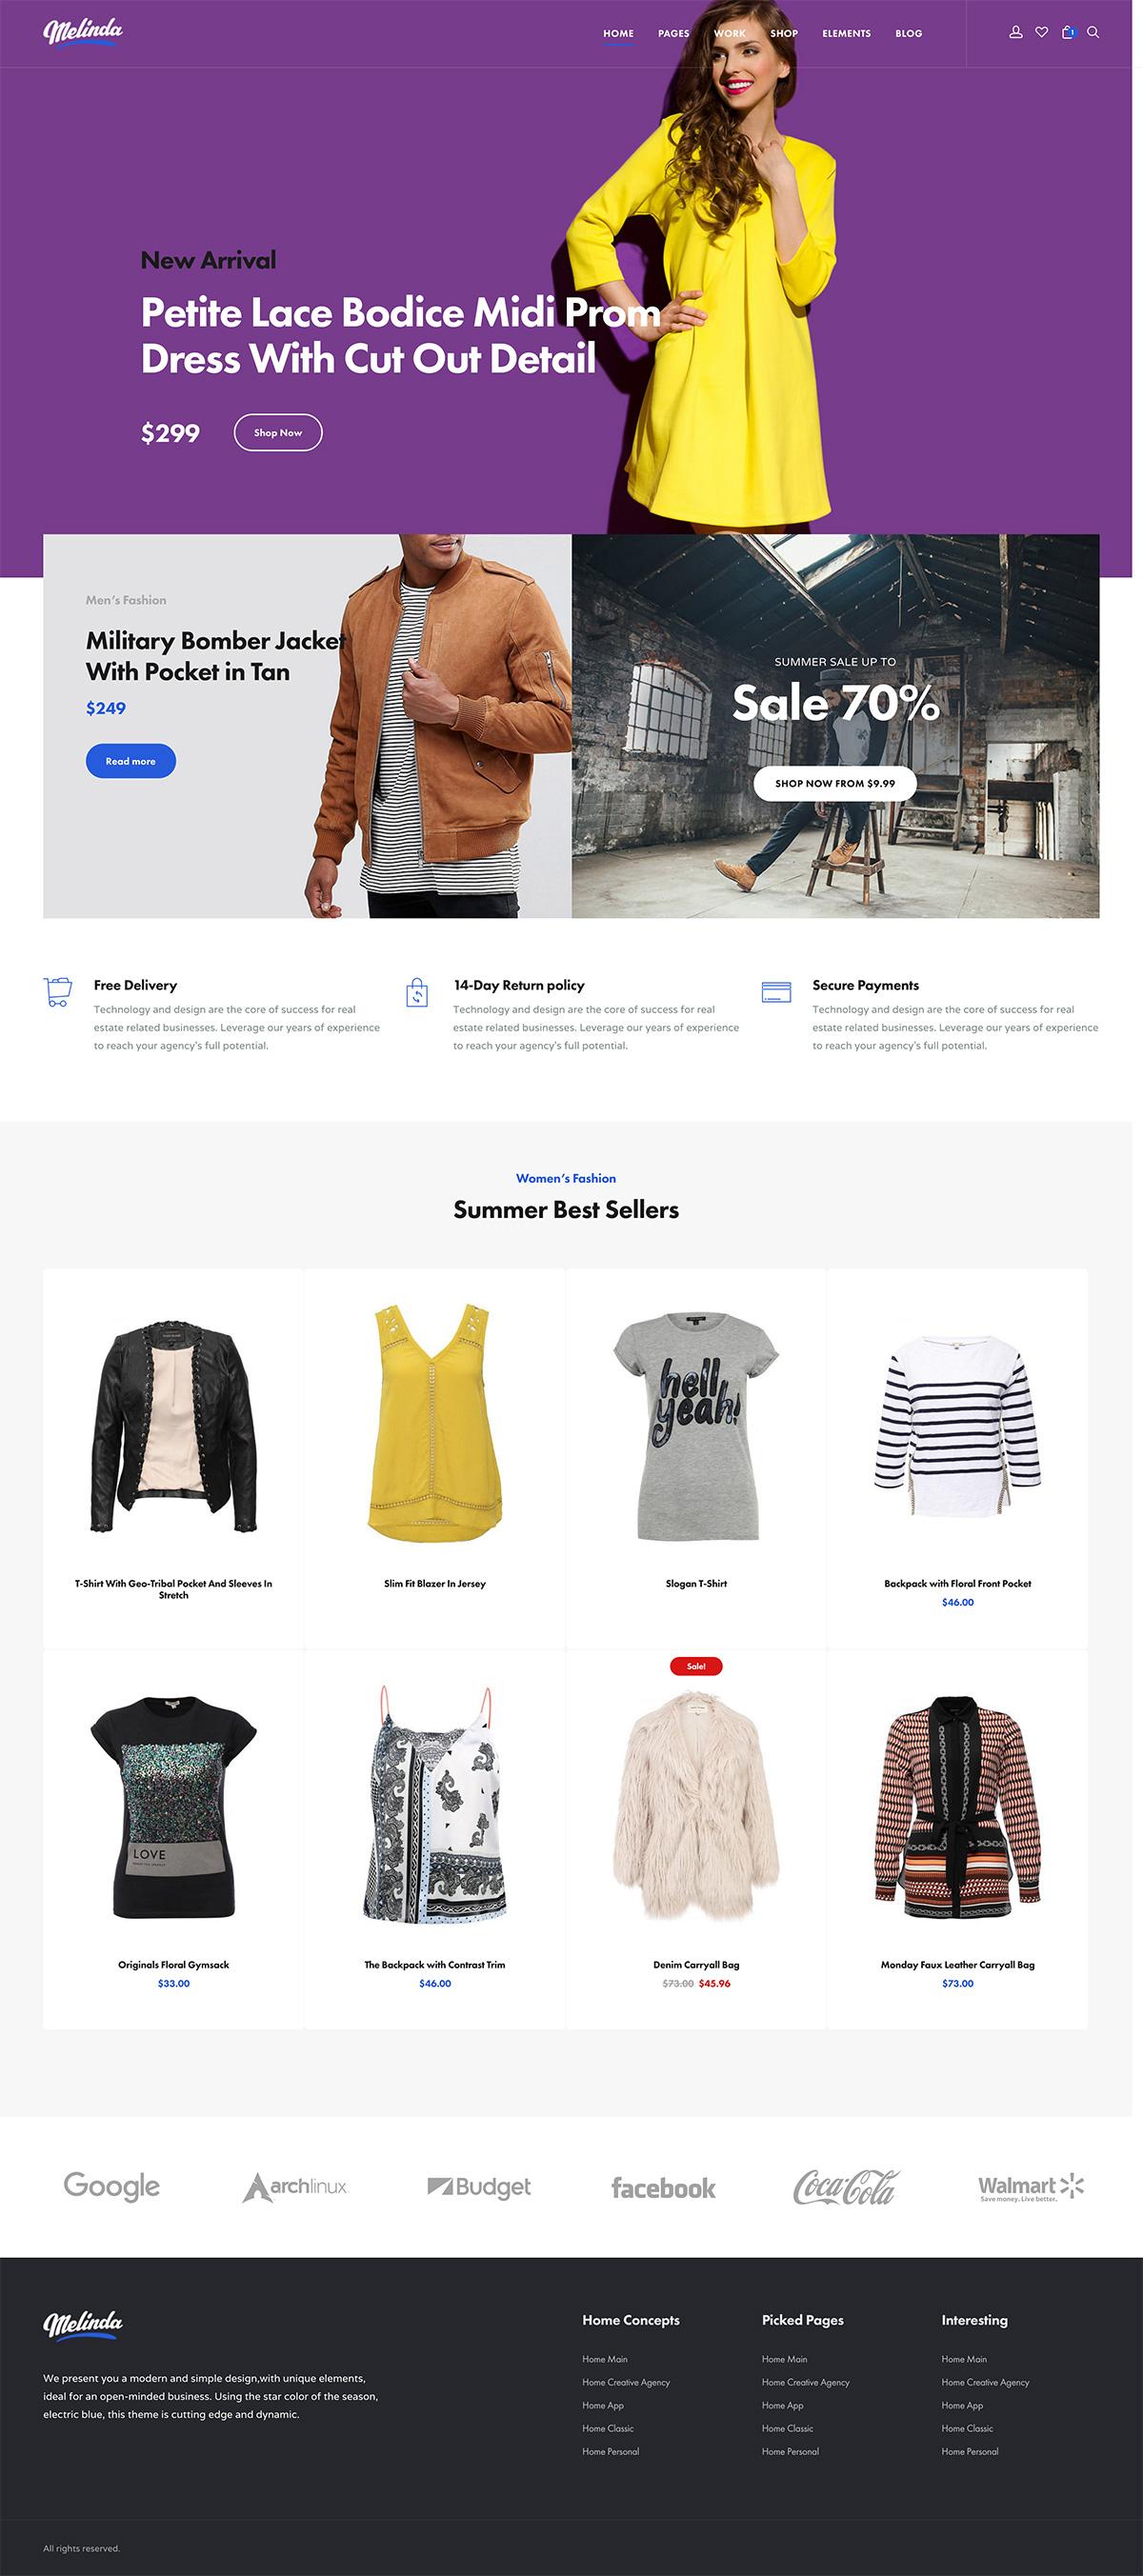 Melinda - Professional Business Multi-Purpose WordPress Theme